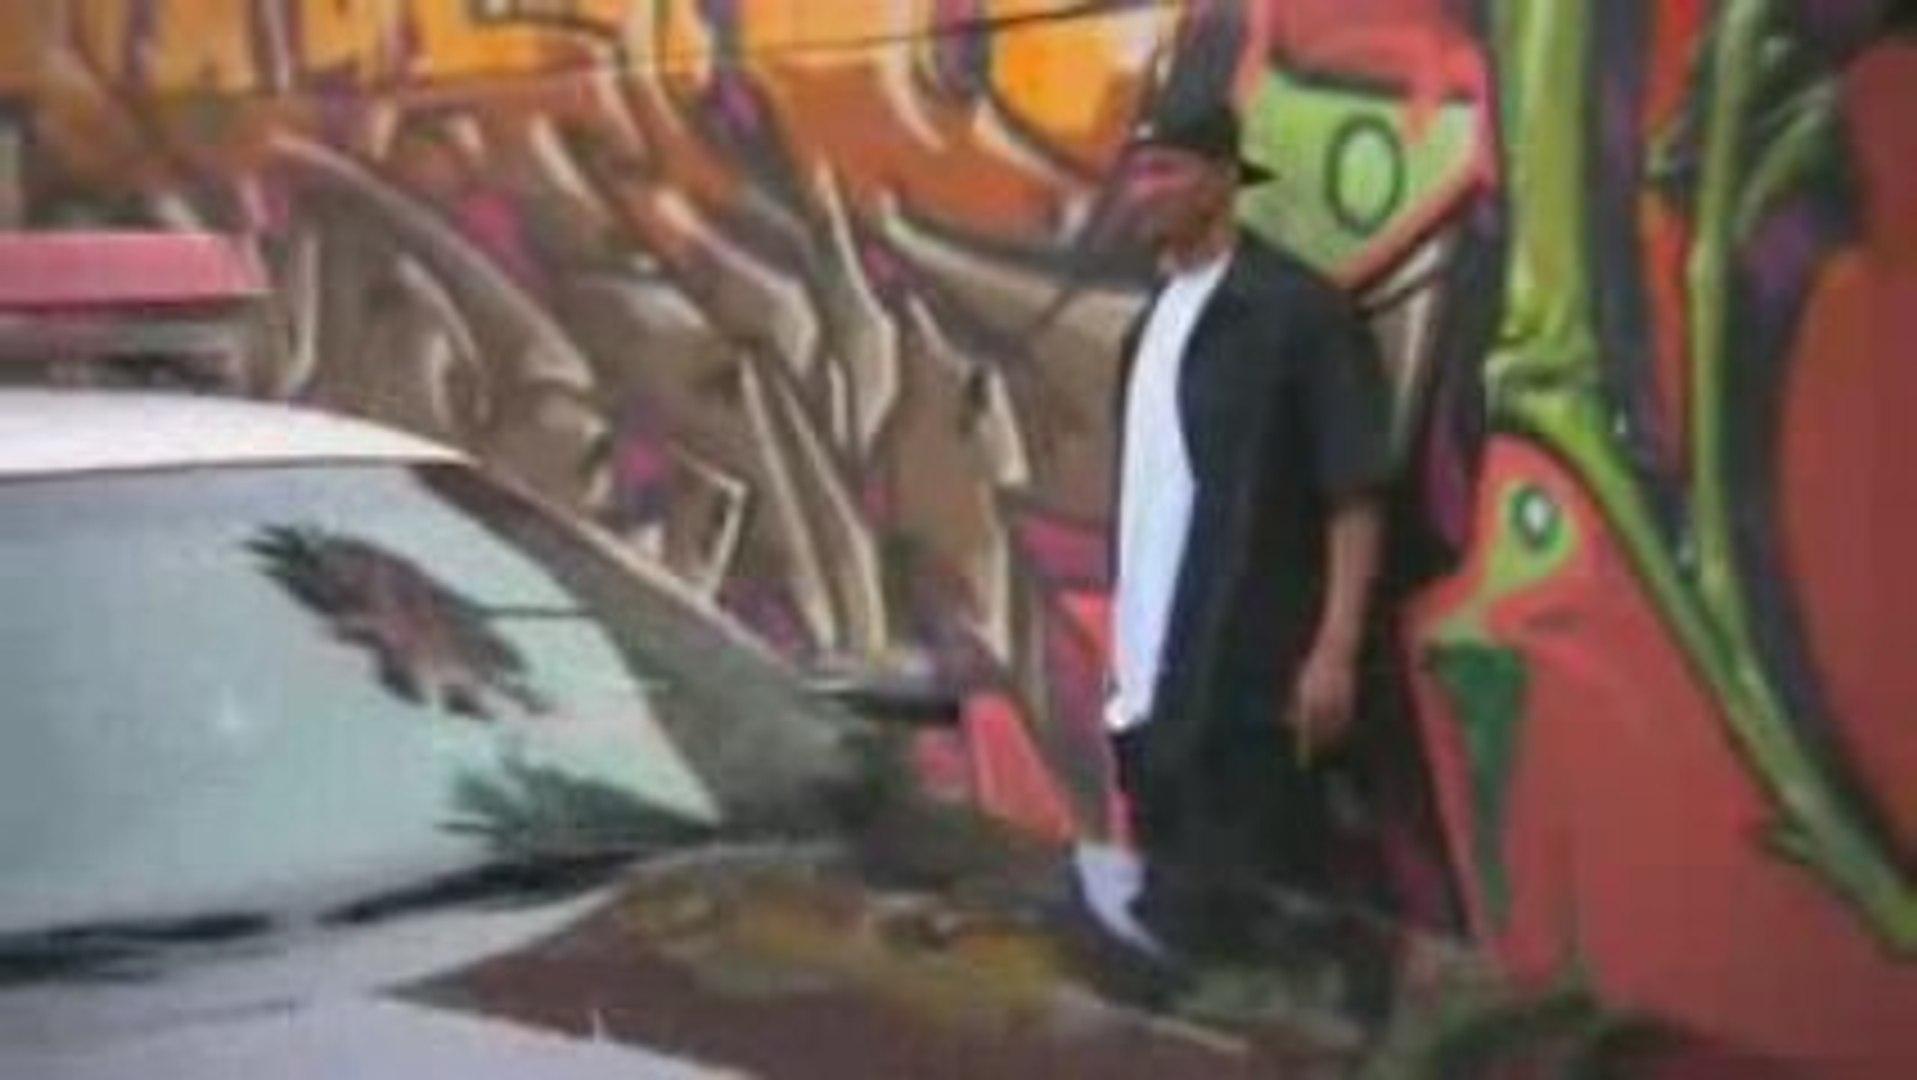 Blaq Poet Feat MC Eiht & Young Malay - Ain't Nuttin' Changed